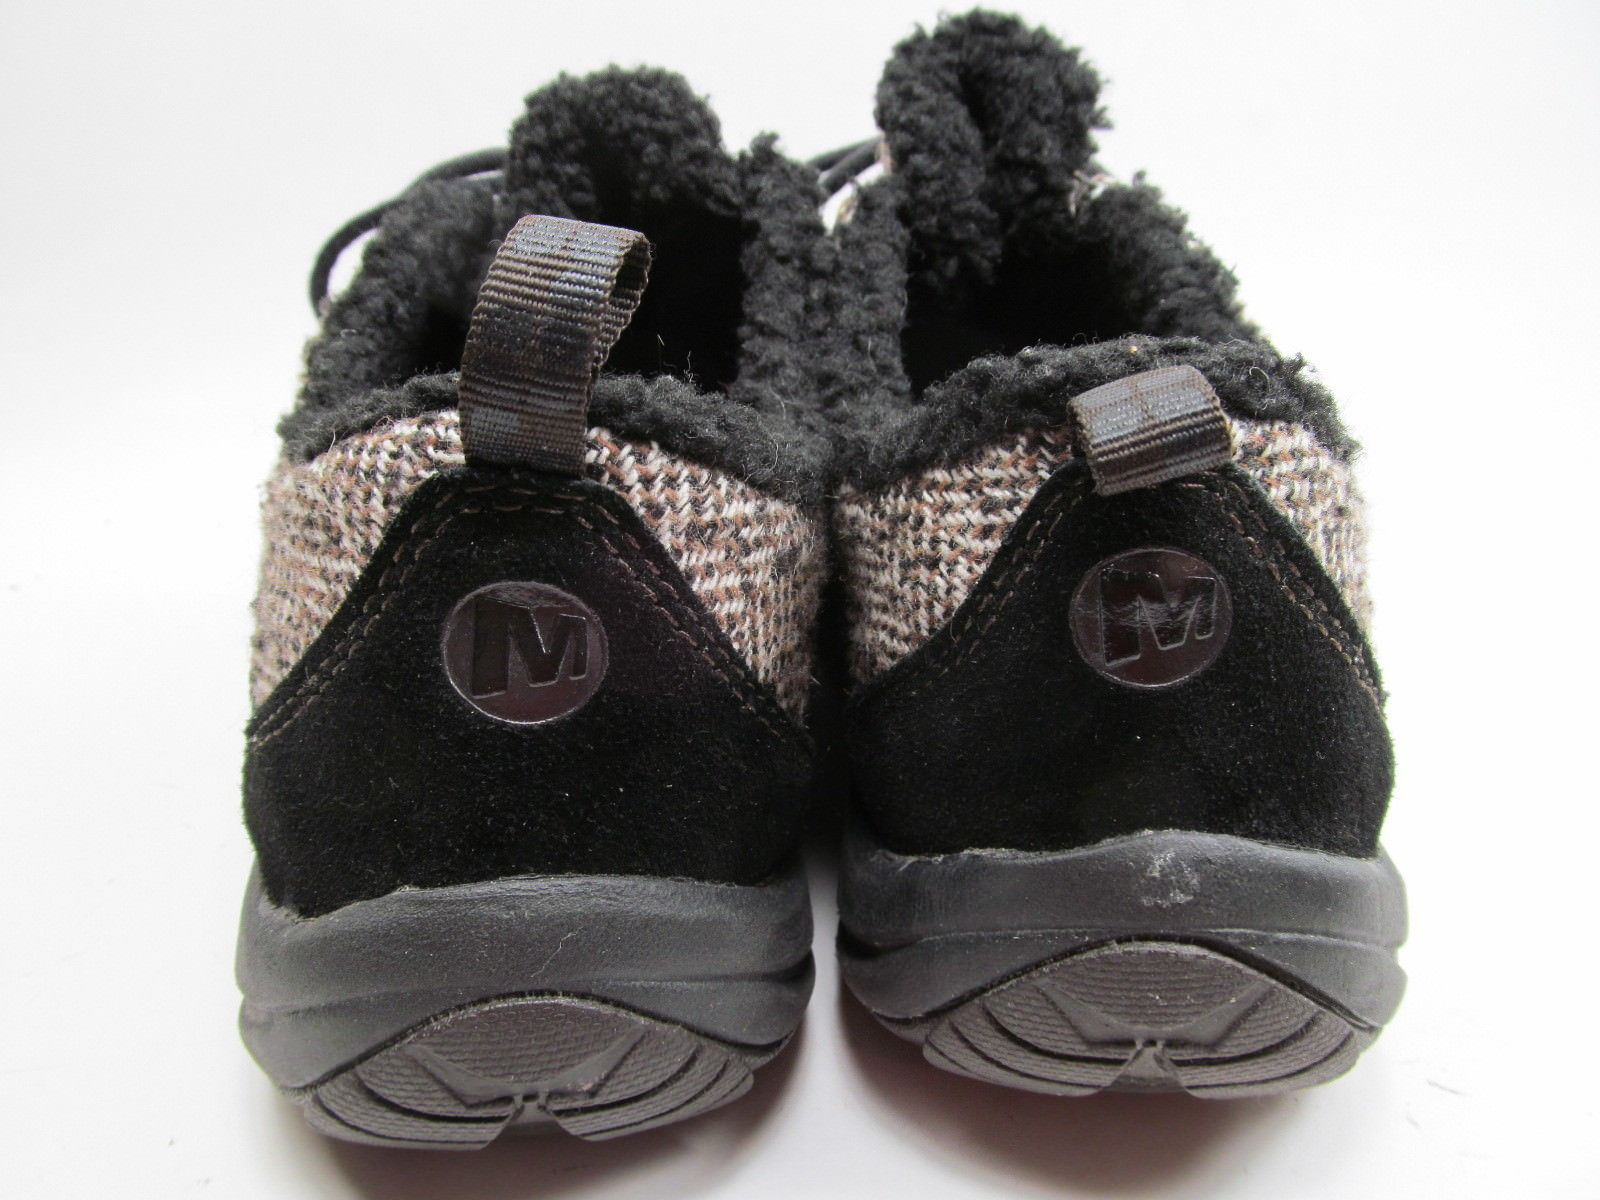 MERRELL Performance Women's Black Suede & Faux Fur Walking Shoes 9 M image 3